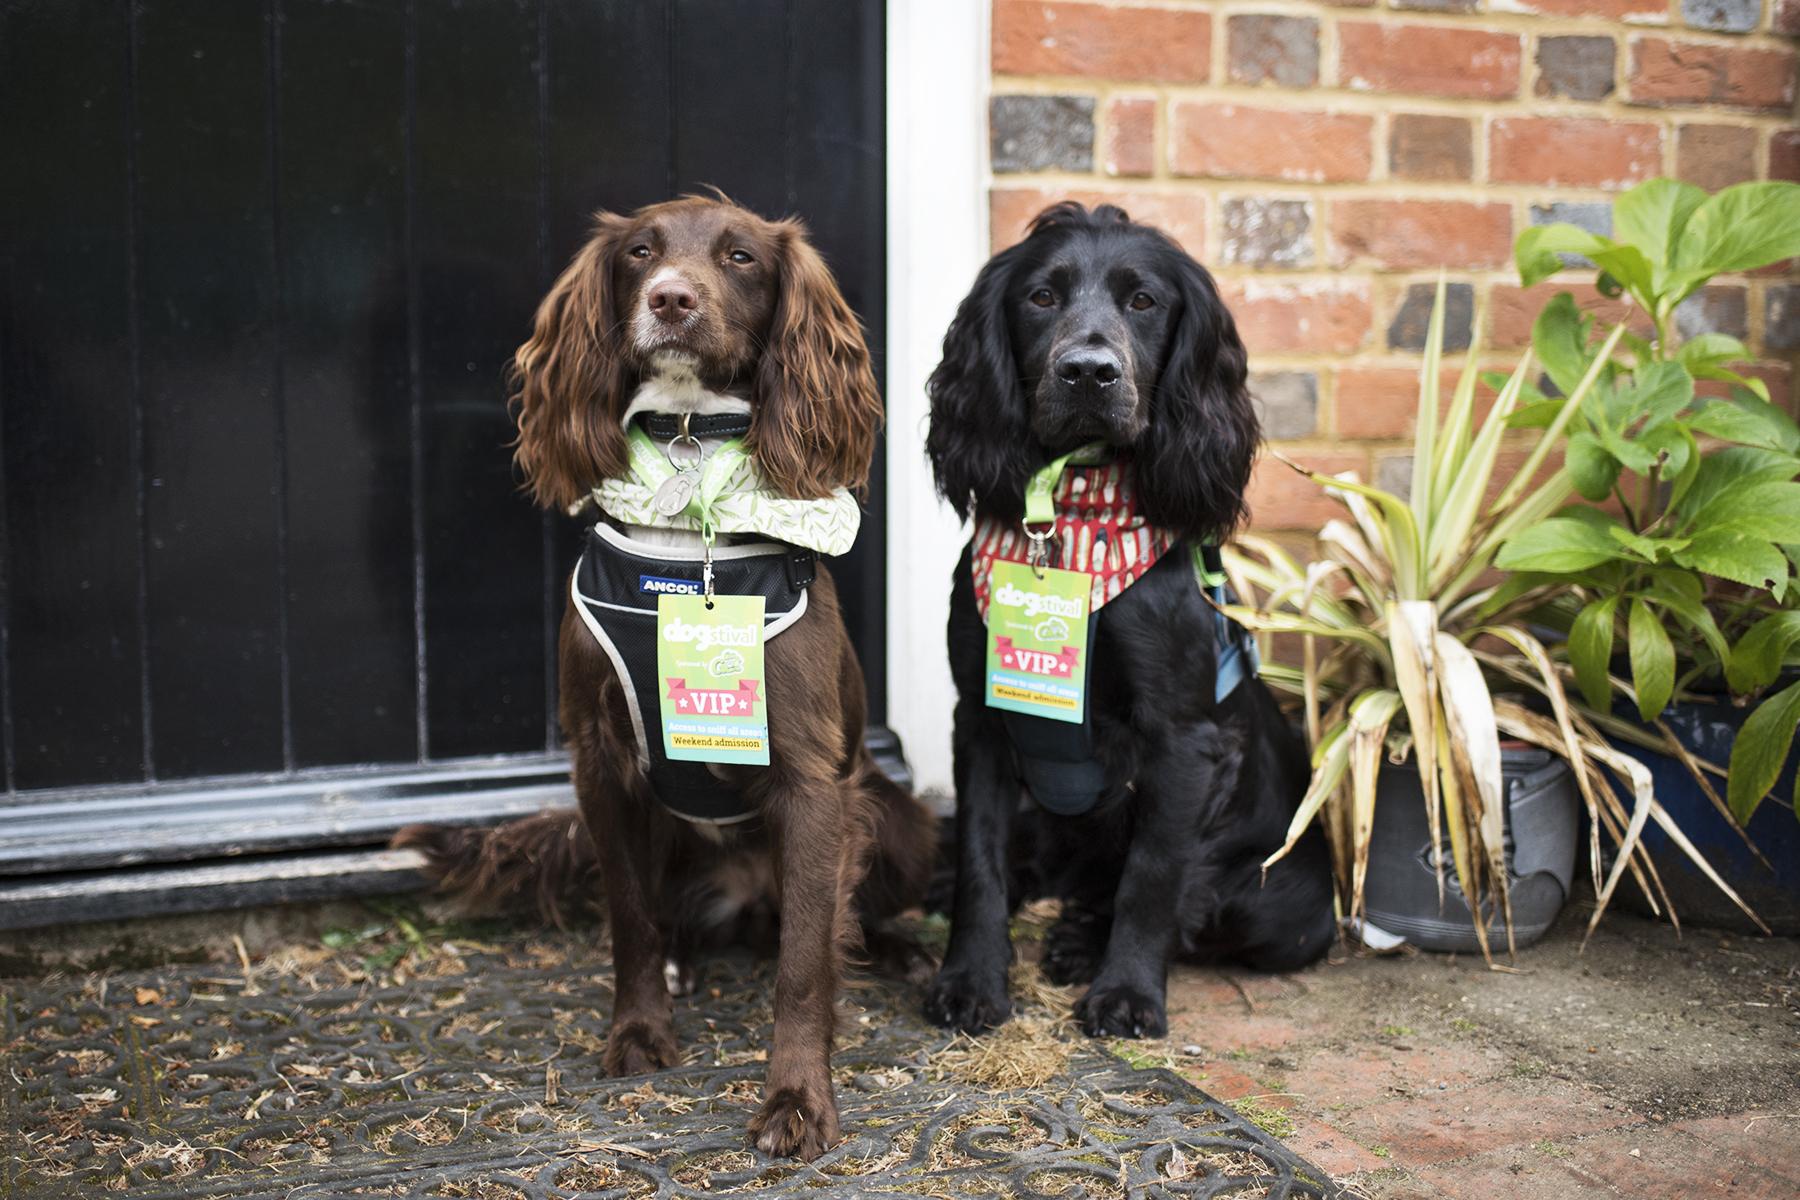 Dogstival | The Cornish Dog